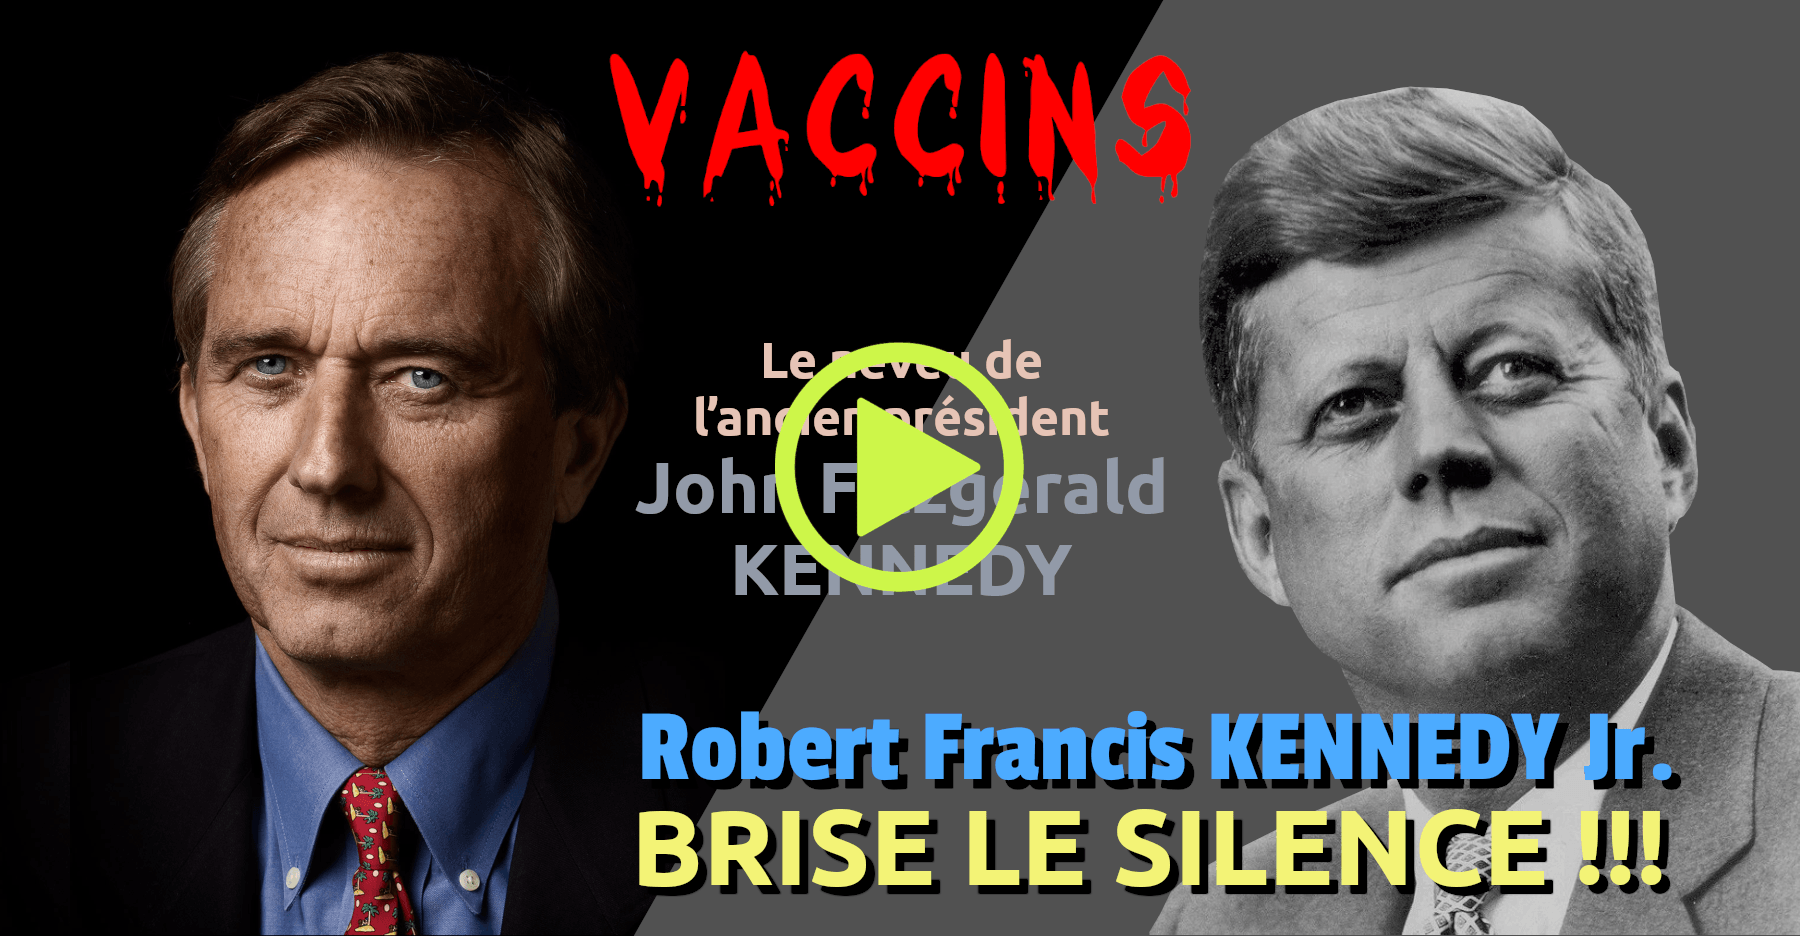 Vaccins Robert Kennedy Brise Le Silence